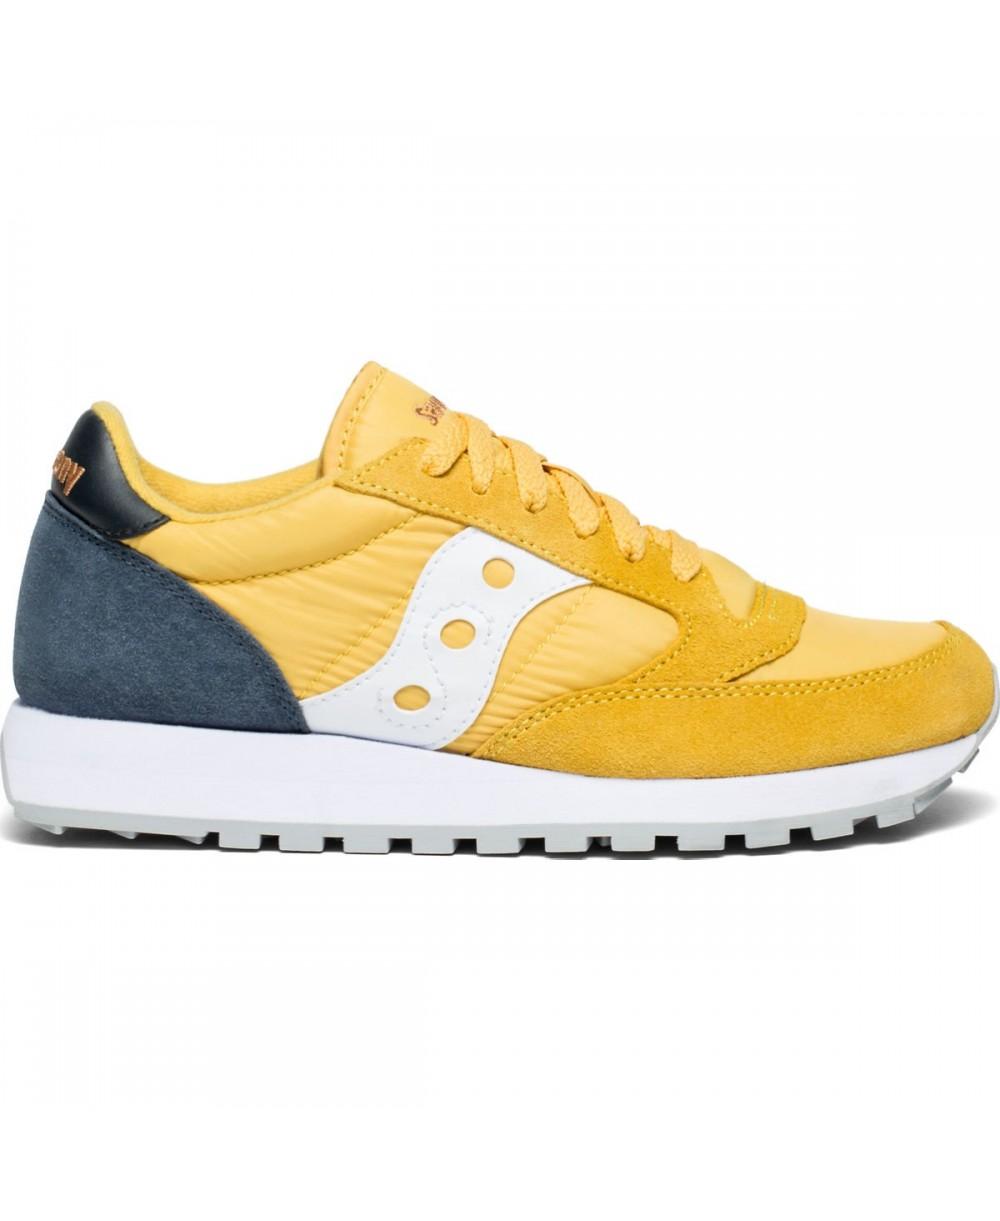 e132573d367b Saucony Women s Jazz Original Sneakers Shoes Yellow Navy